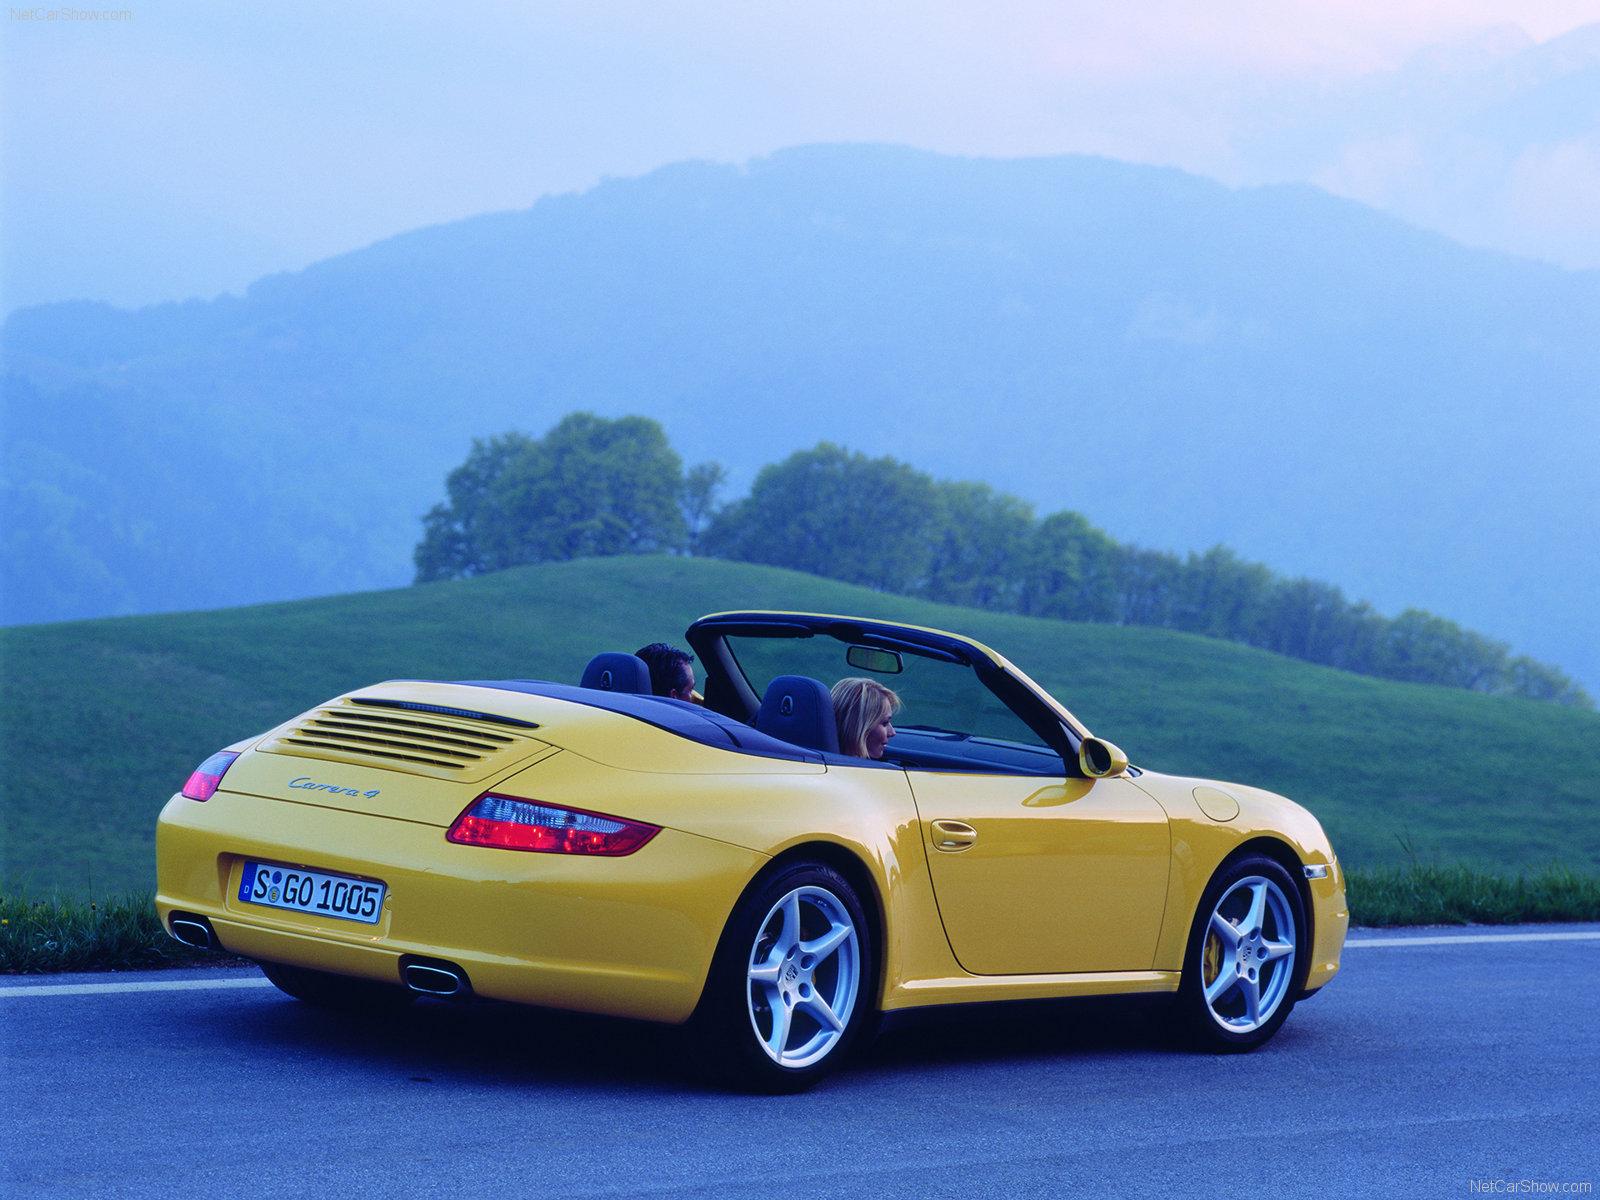 2006 yellow porsche 911 carrera 4 cabriolet wallpapers. Black Bedroom Furniture Sets. Home Design Ideas